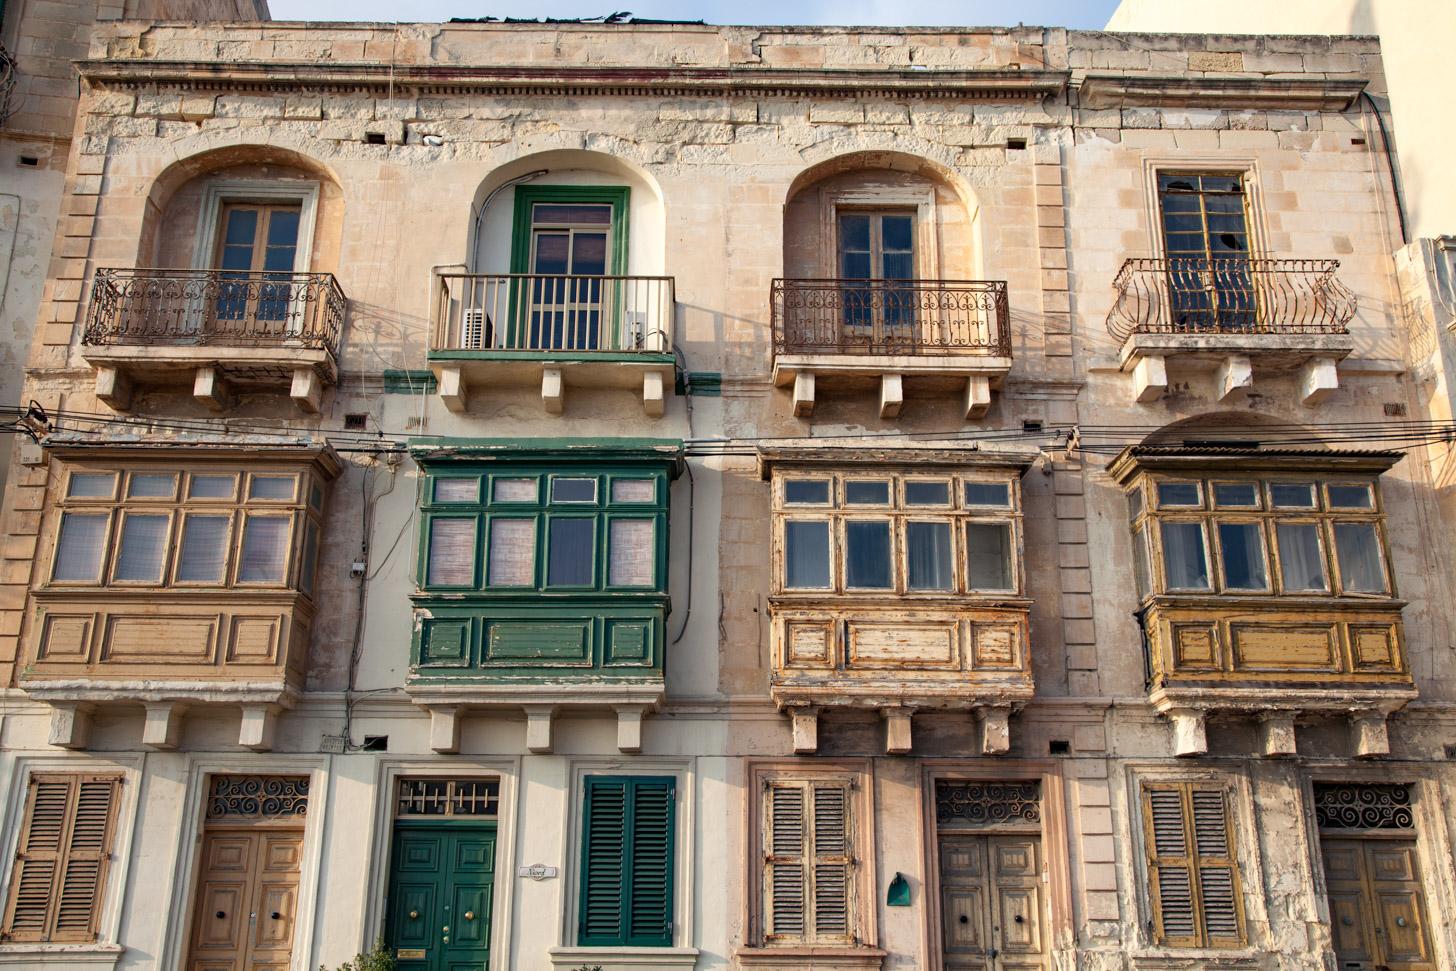 gevels in Malta